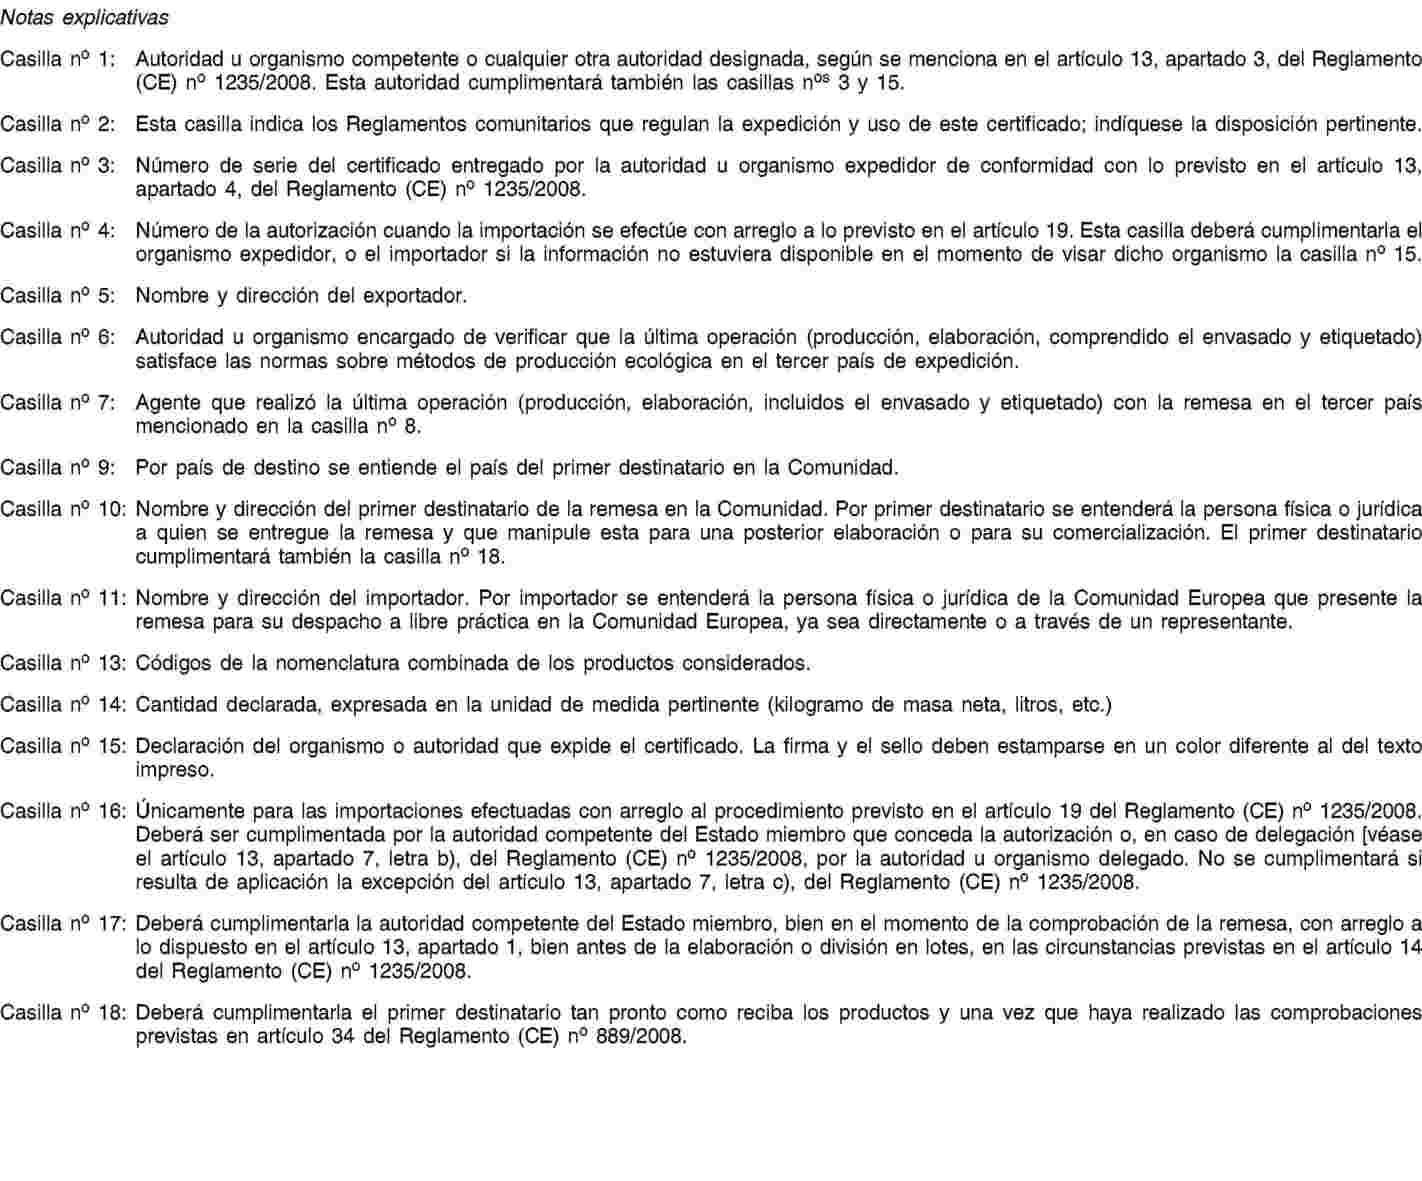 Imagen: https://eur-lex.europa.eu/resource.html?uri=uriserv:OJ.L_.2008.334.01.0025.01.SPA.xhtml.L_2008334ES.01004701.tif.jpg